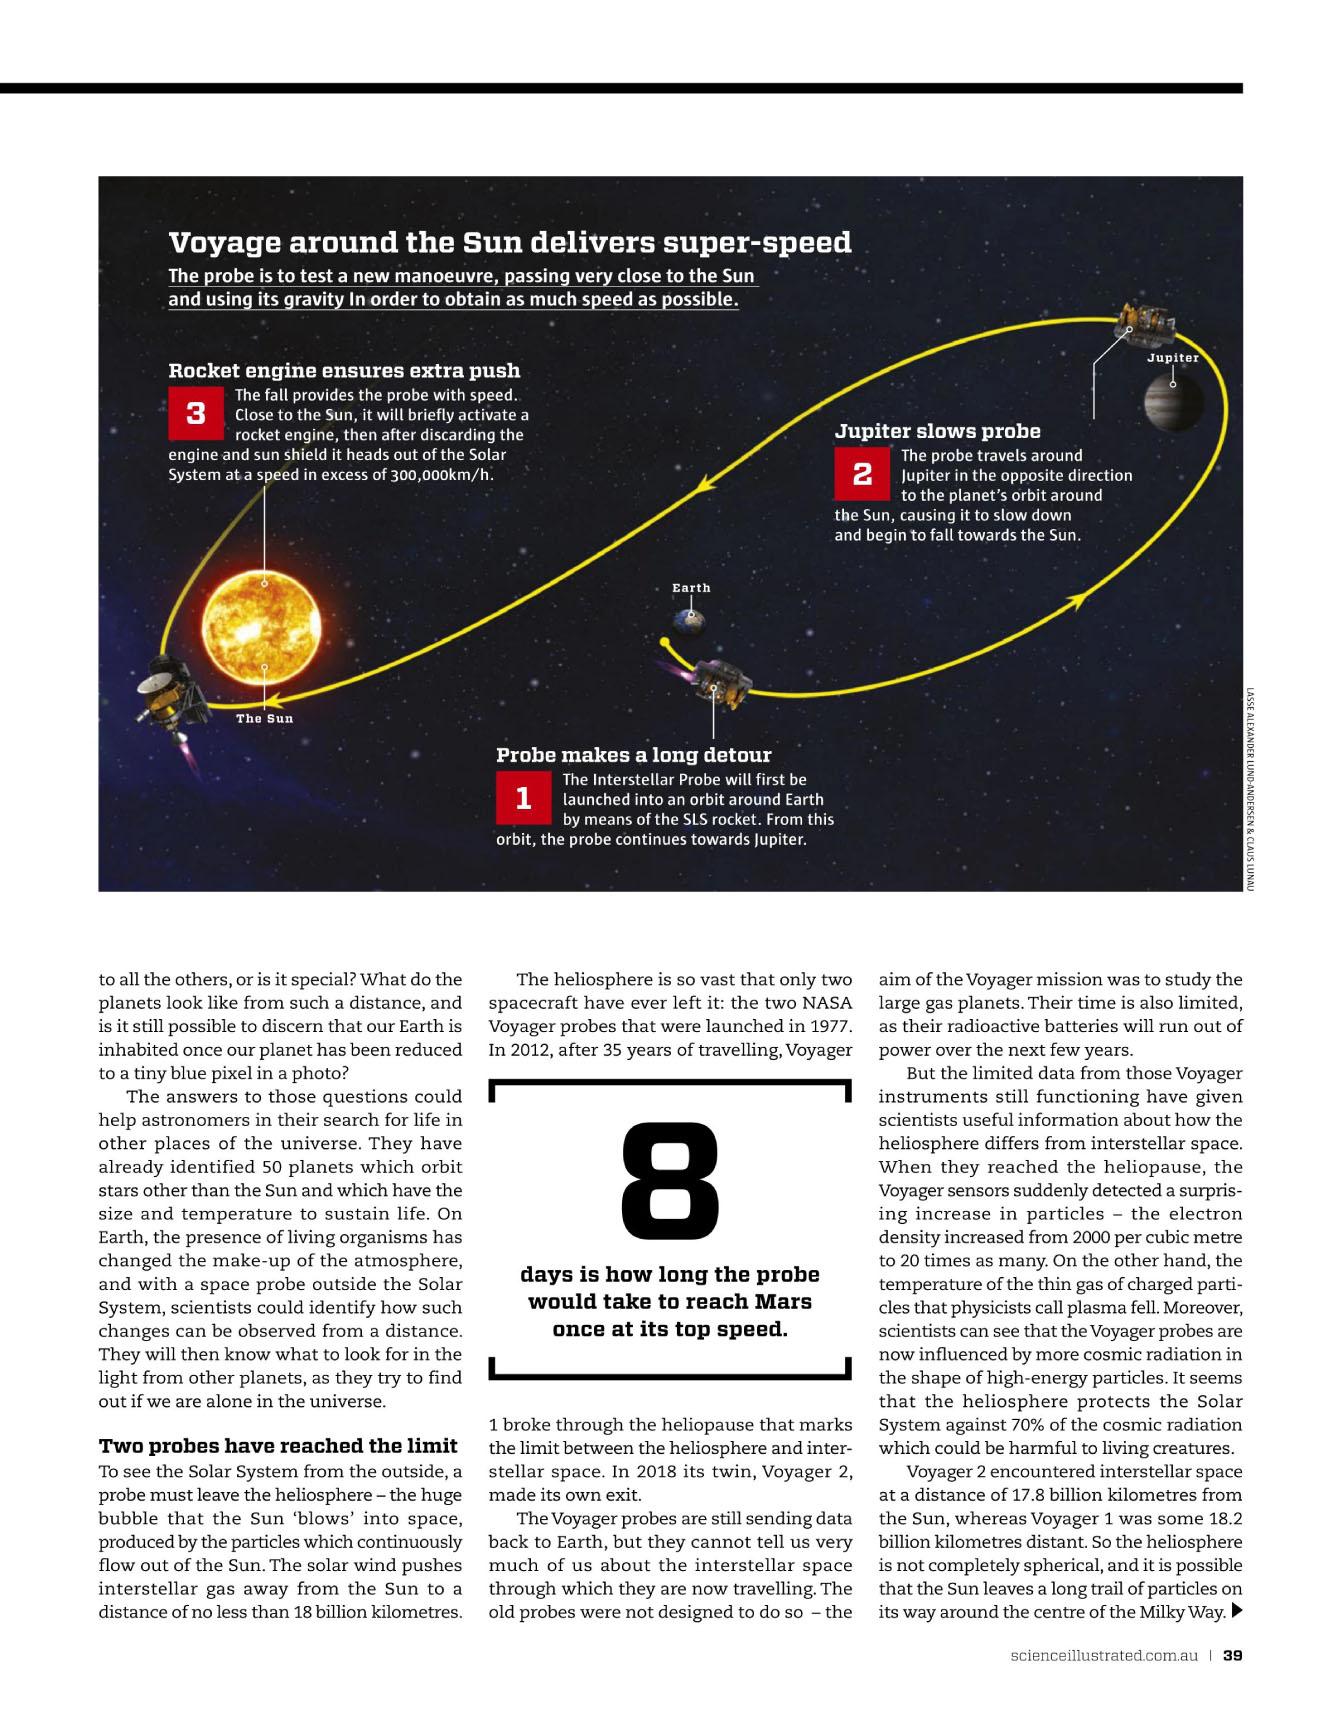 Science Illustrated 077 2020-08 New Probe 03.jpg